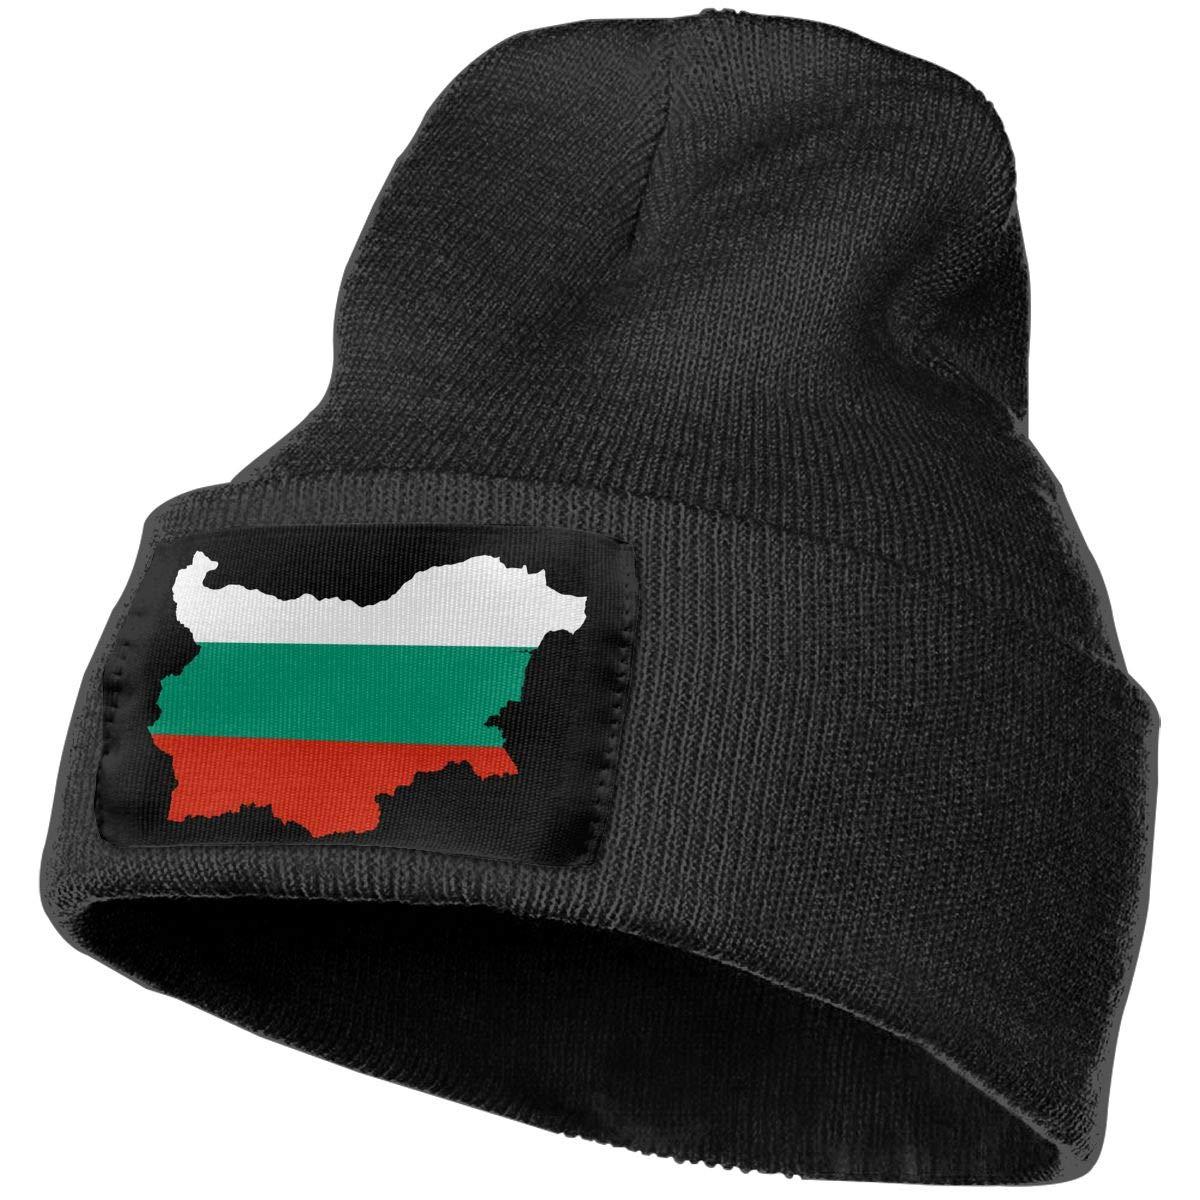 SLADDD1 Bulgaria Warm Winter Hat Knit Beanie Skull Cap Cuff Beanie Hat Winter Hats for Men /& Women